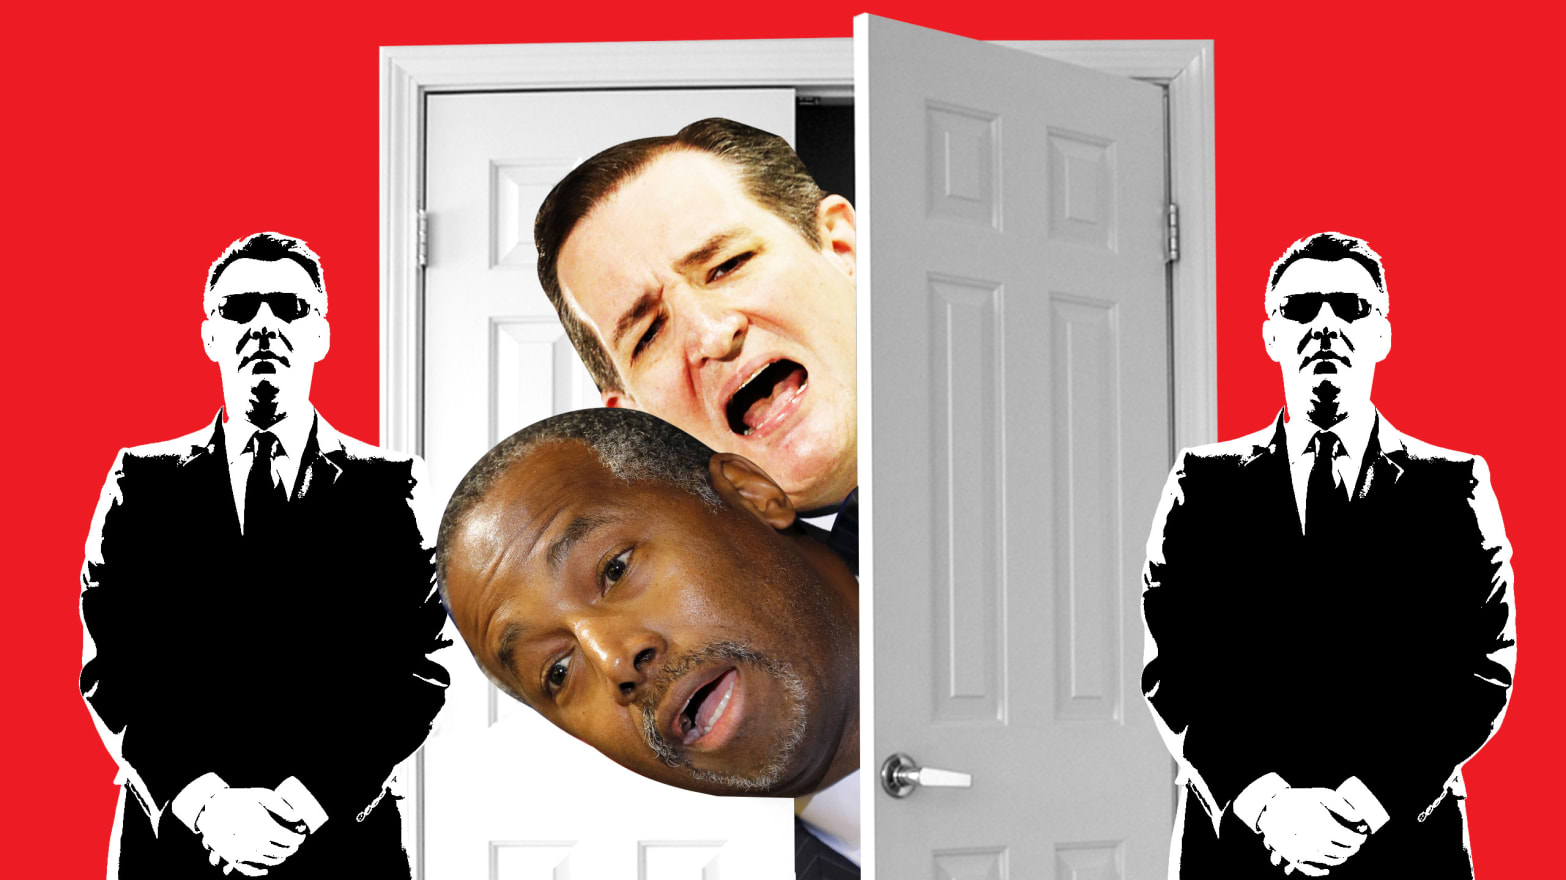 Cruz Carson Held Secret Meeting About Dirty Tricks In A Closet